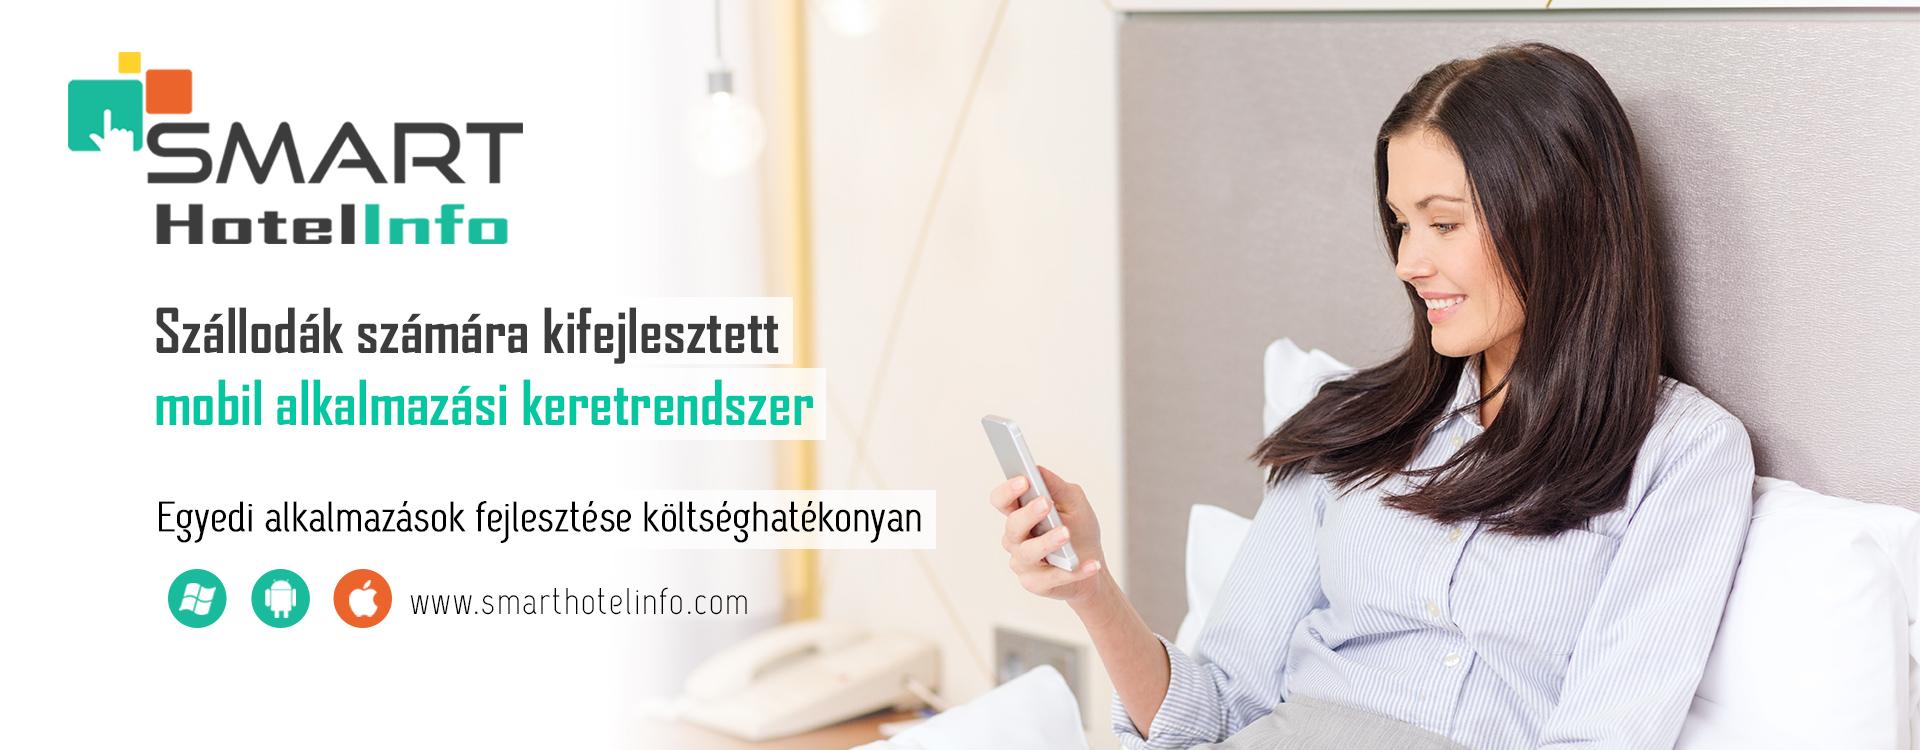 slider_smarthotelinfo_infotec